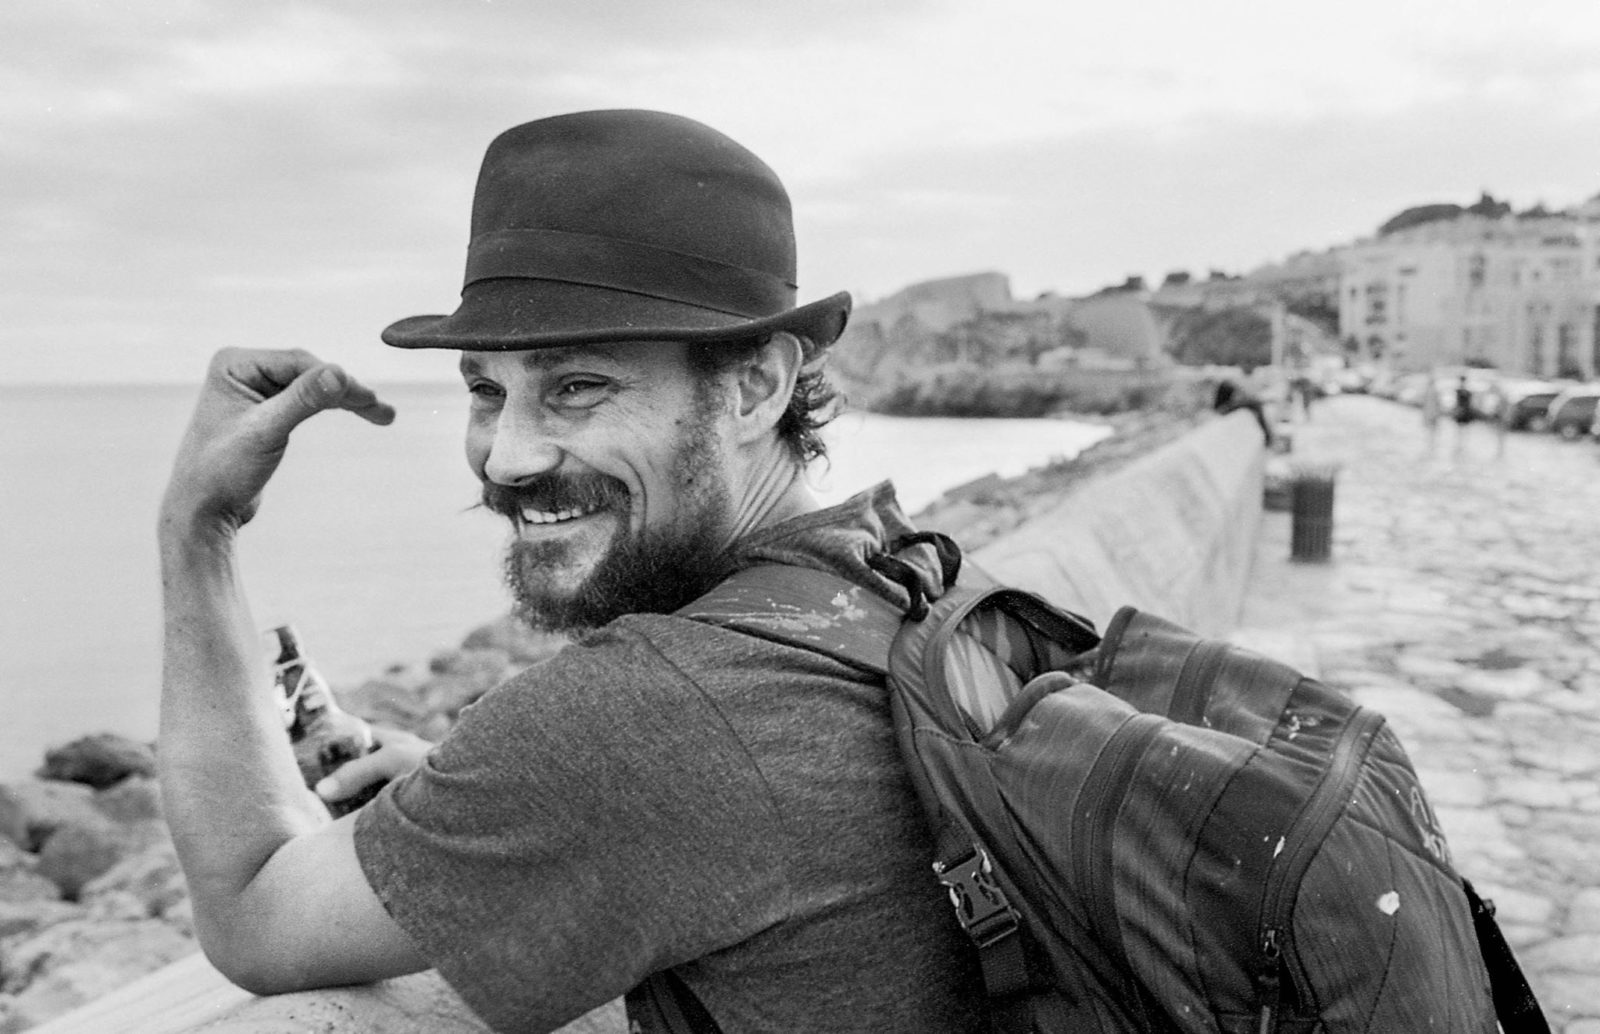 Iretge ulule radar argentique livre projet soutien portraits - Coup de pouce RADAR x Ulule : IRETGE